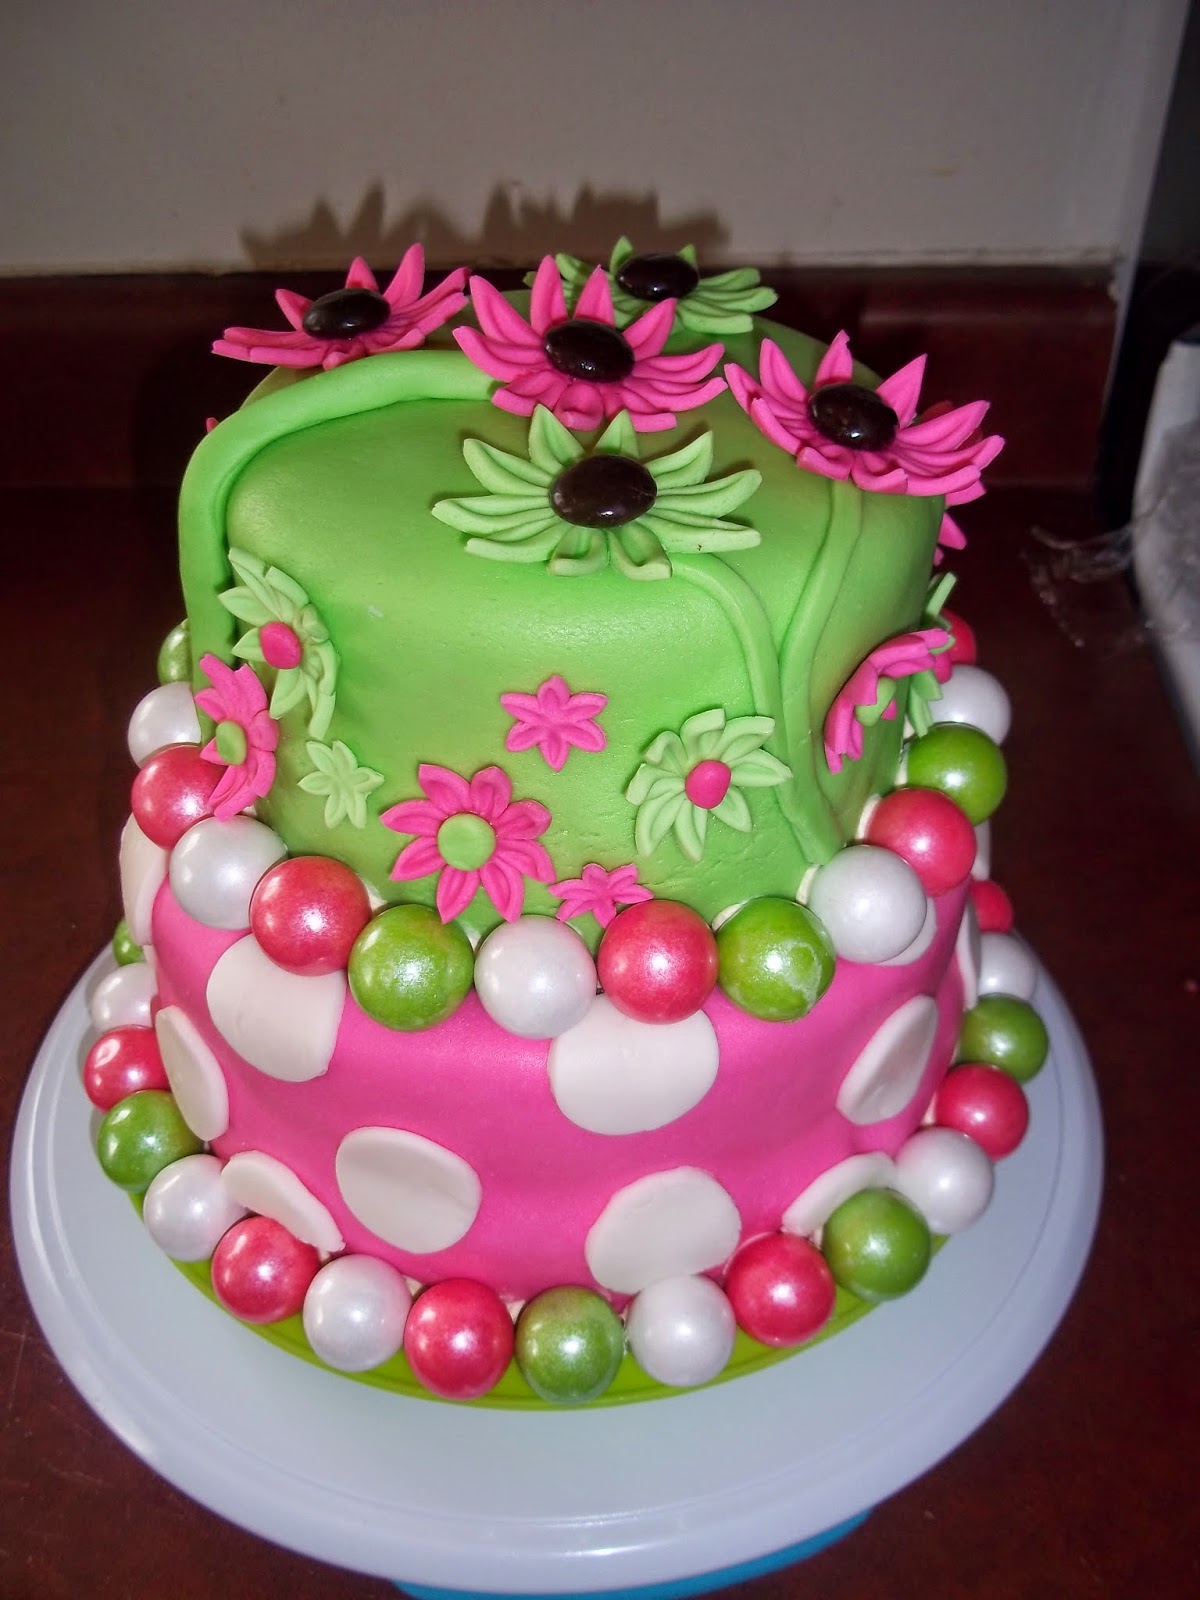 Duck baby shower cake pops recipes - duck baby shower cake ...